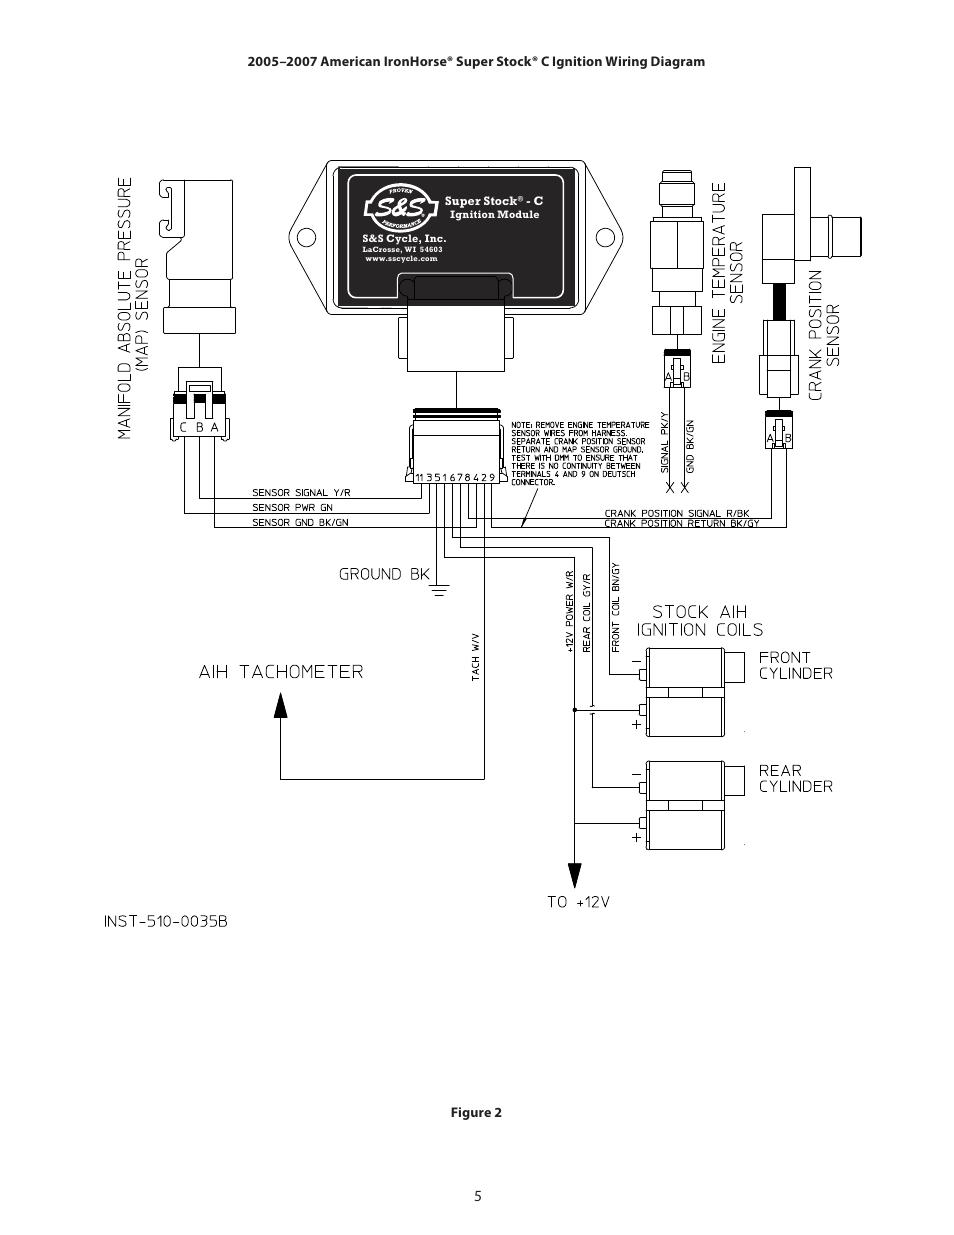 2007 fxst wiring diagram 2005 chevy trailblazer stereo 1990 heritage softail best library on a victory v92c honda vtx 1800 harley